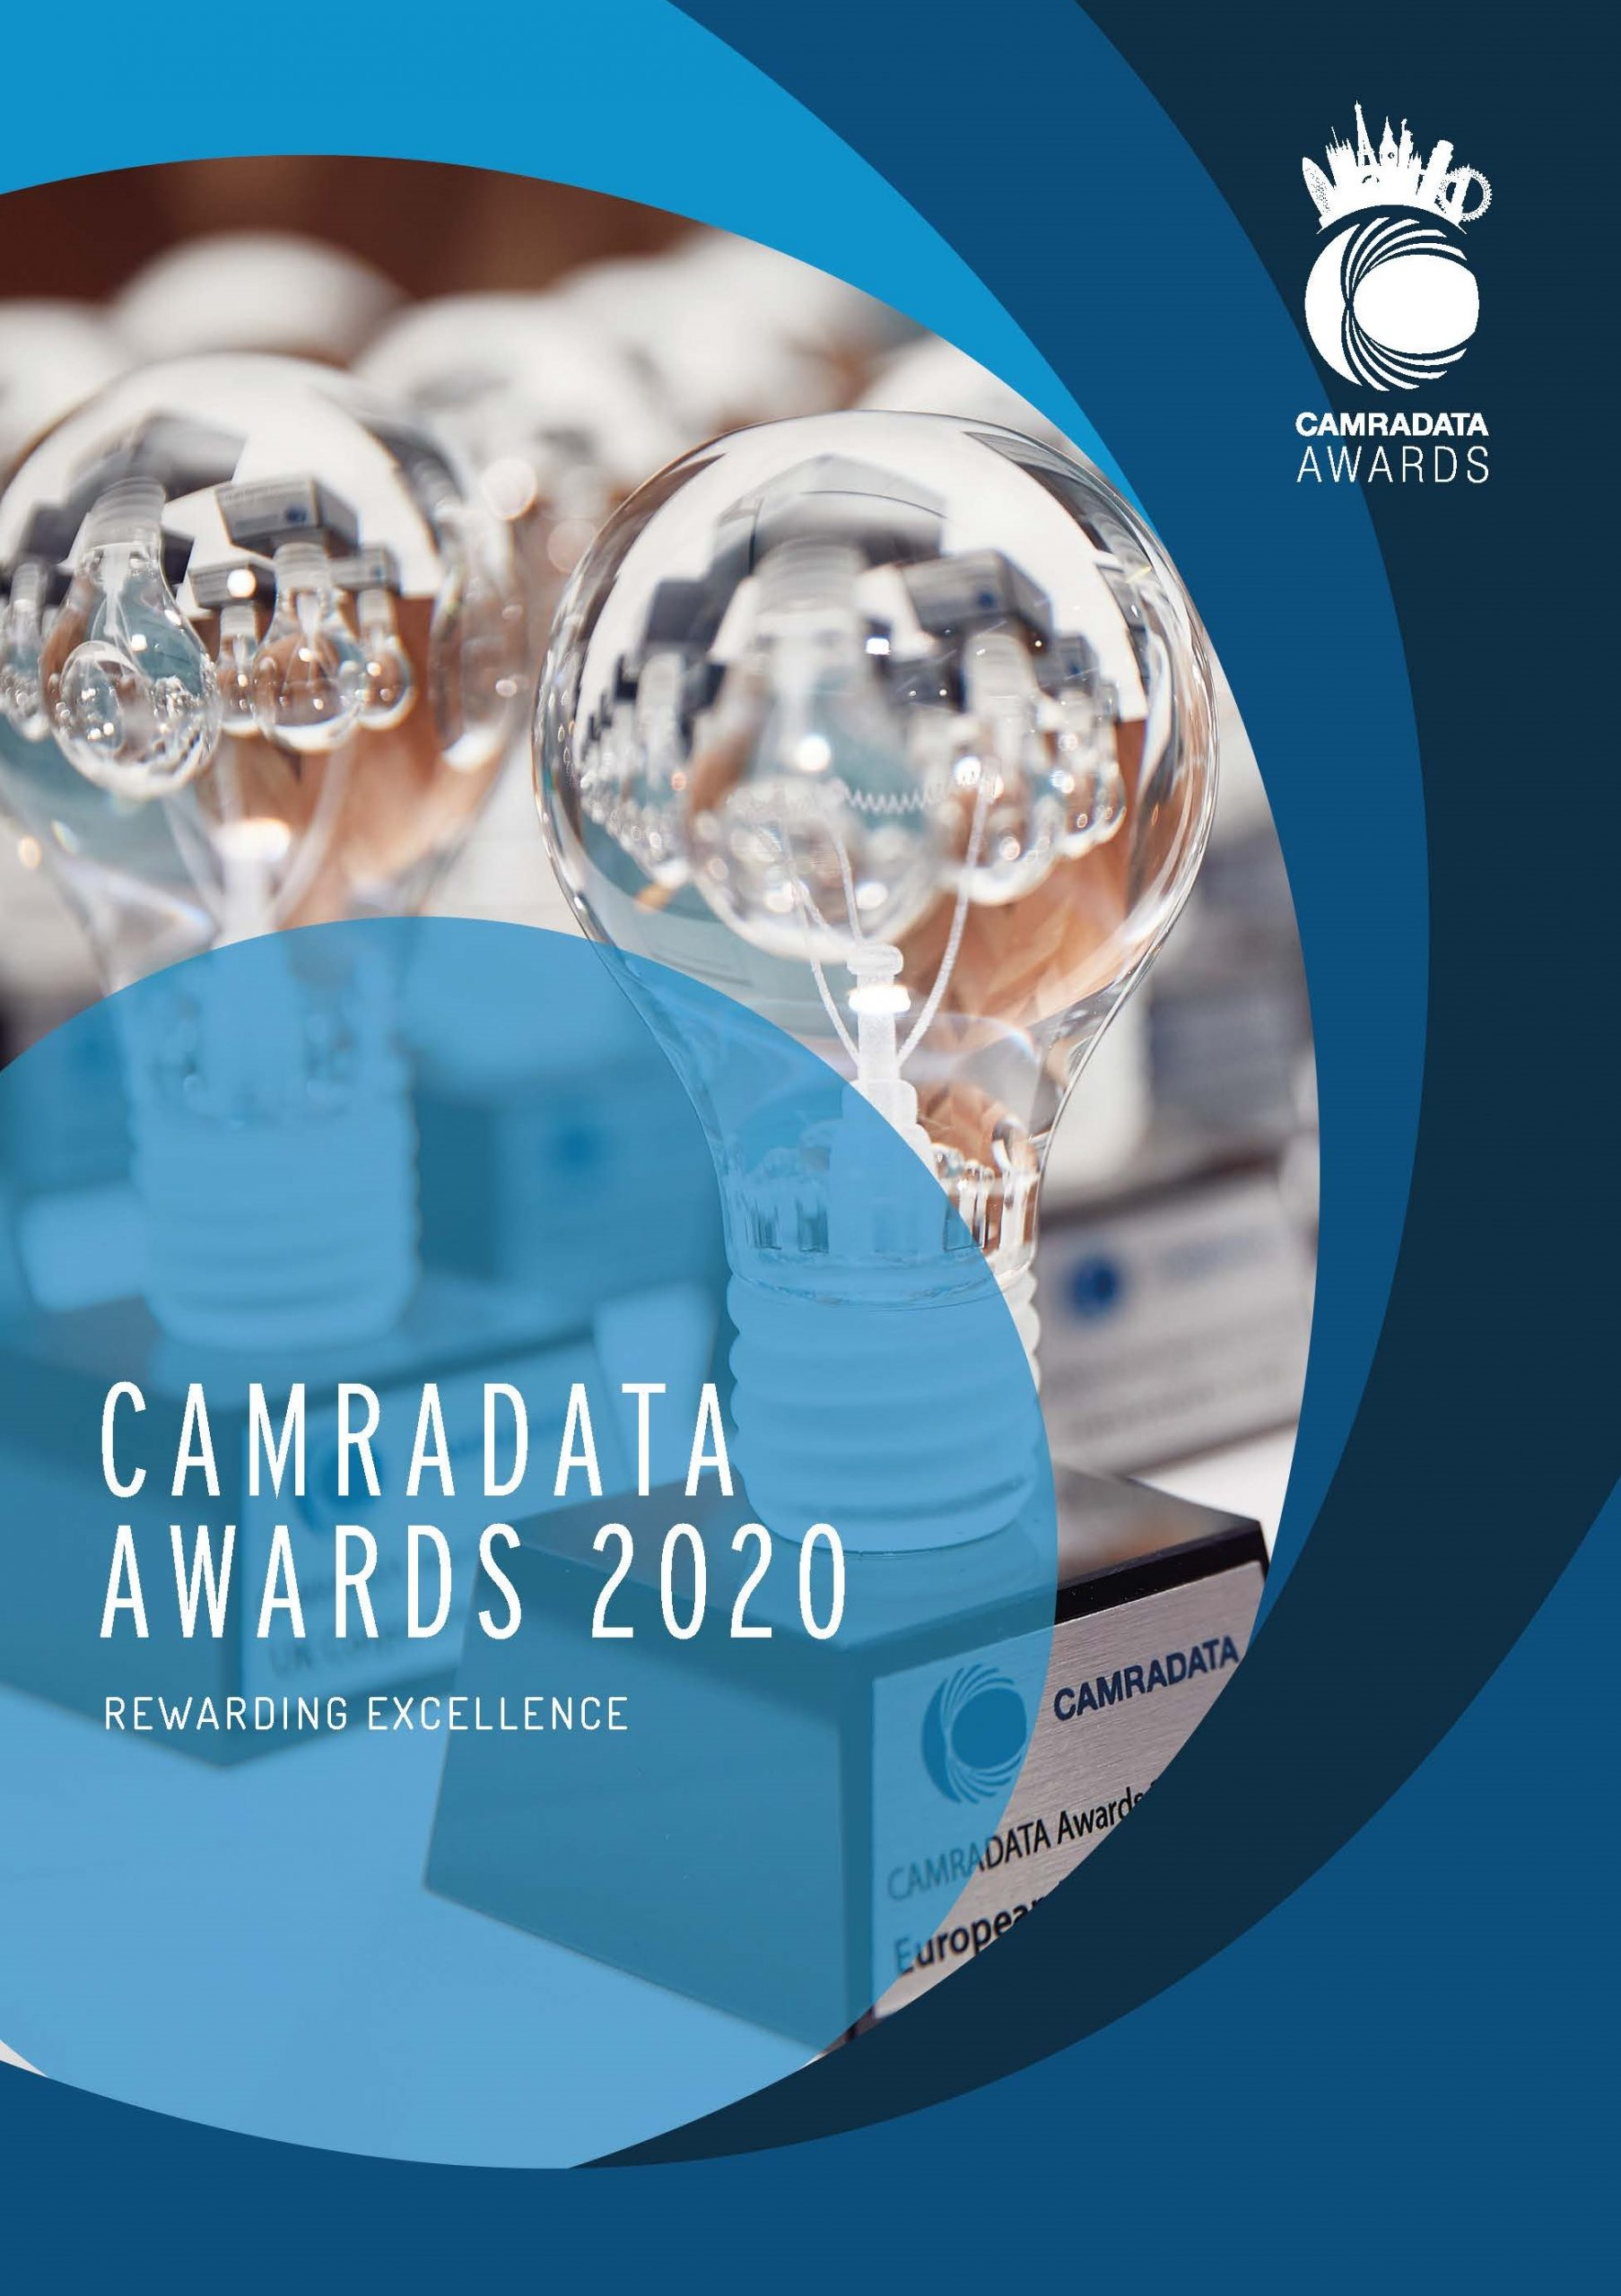 CAMRADATA Awards 2020